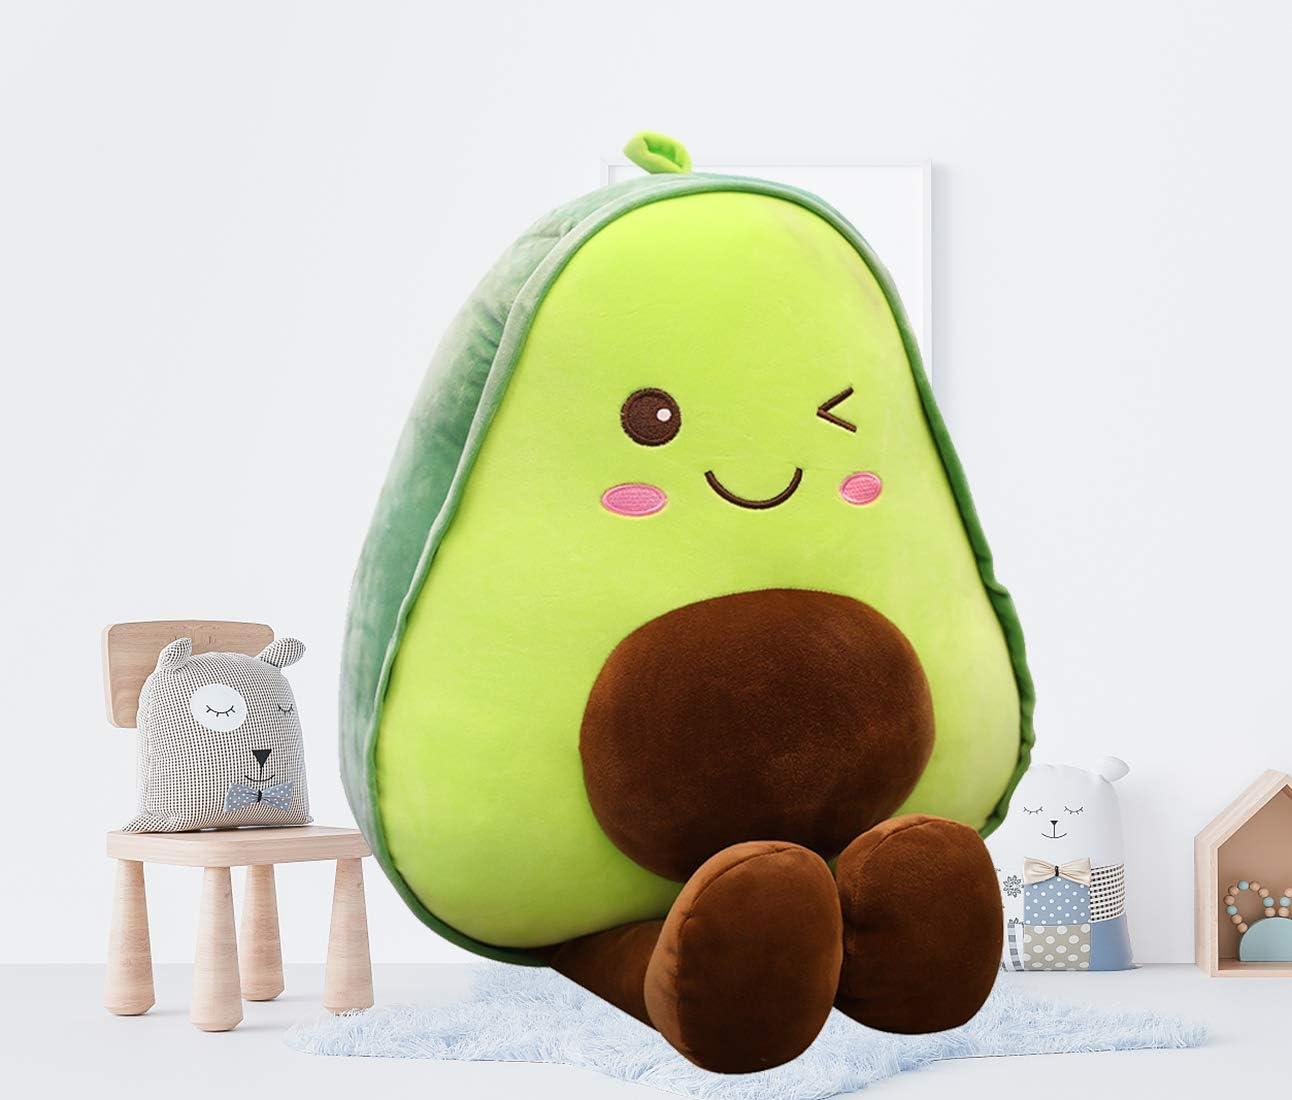 "11.8"" Avocado Plush Cute Stuffed Plush Toy Fruit Shaped Food Pillow Soft HuggingKawaii Pillow Gifts for Kids, Girl, Boy, Friends Bedding,Office,Bedroom,Sofa,Christmas"